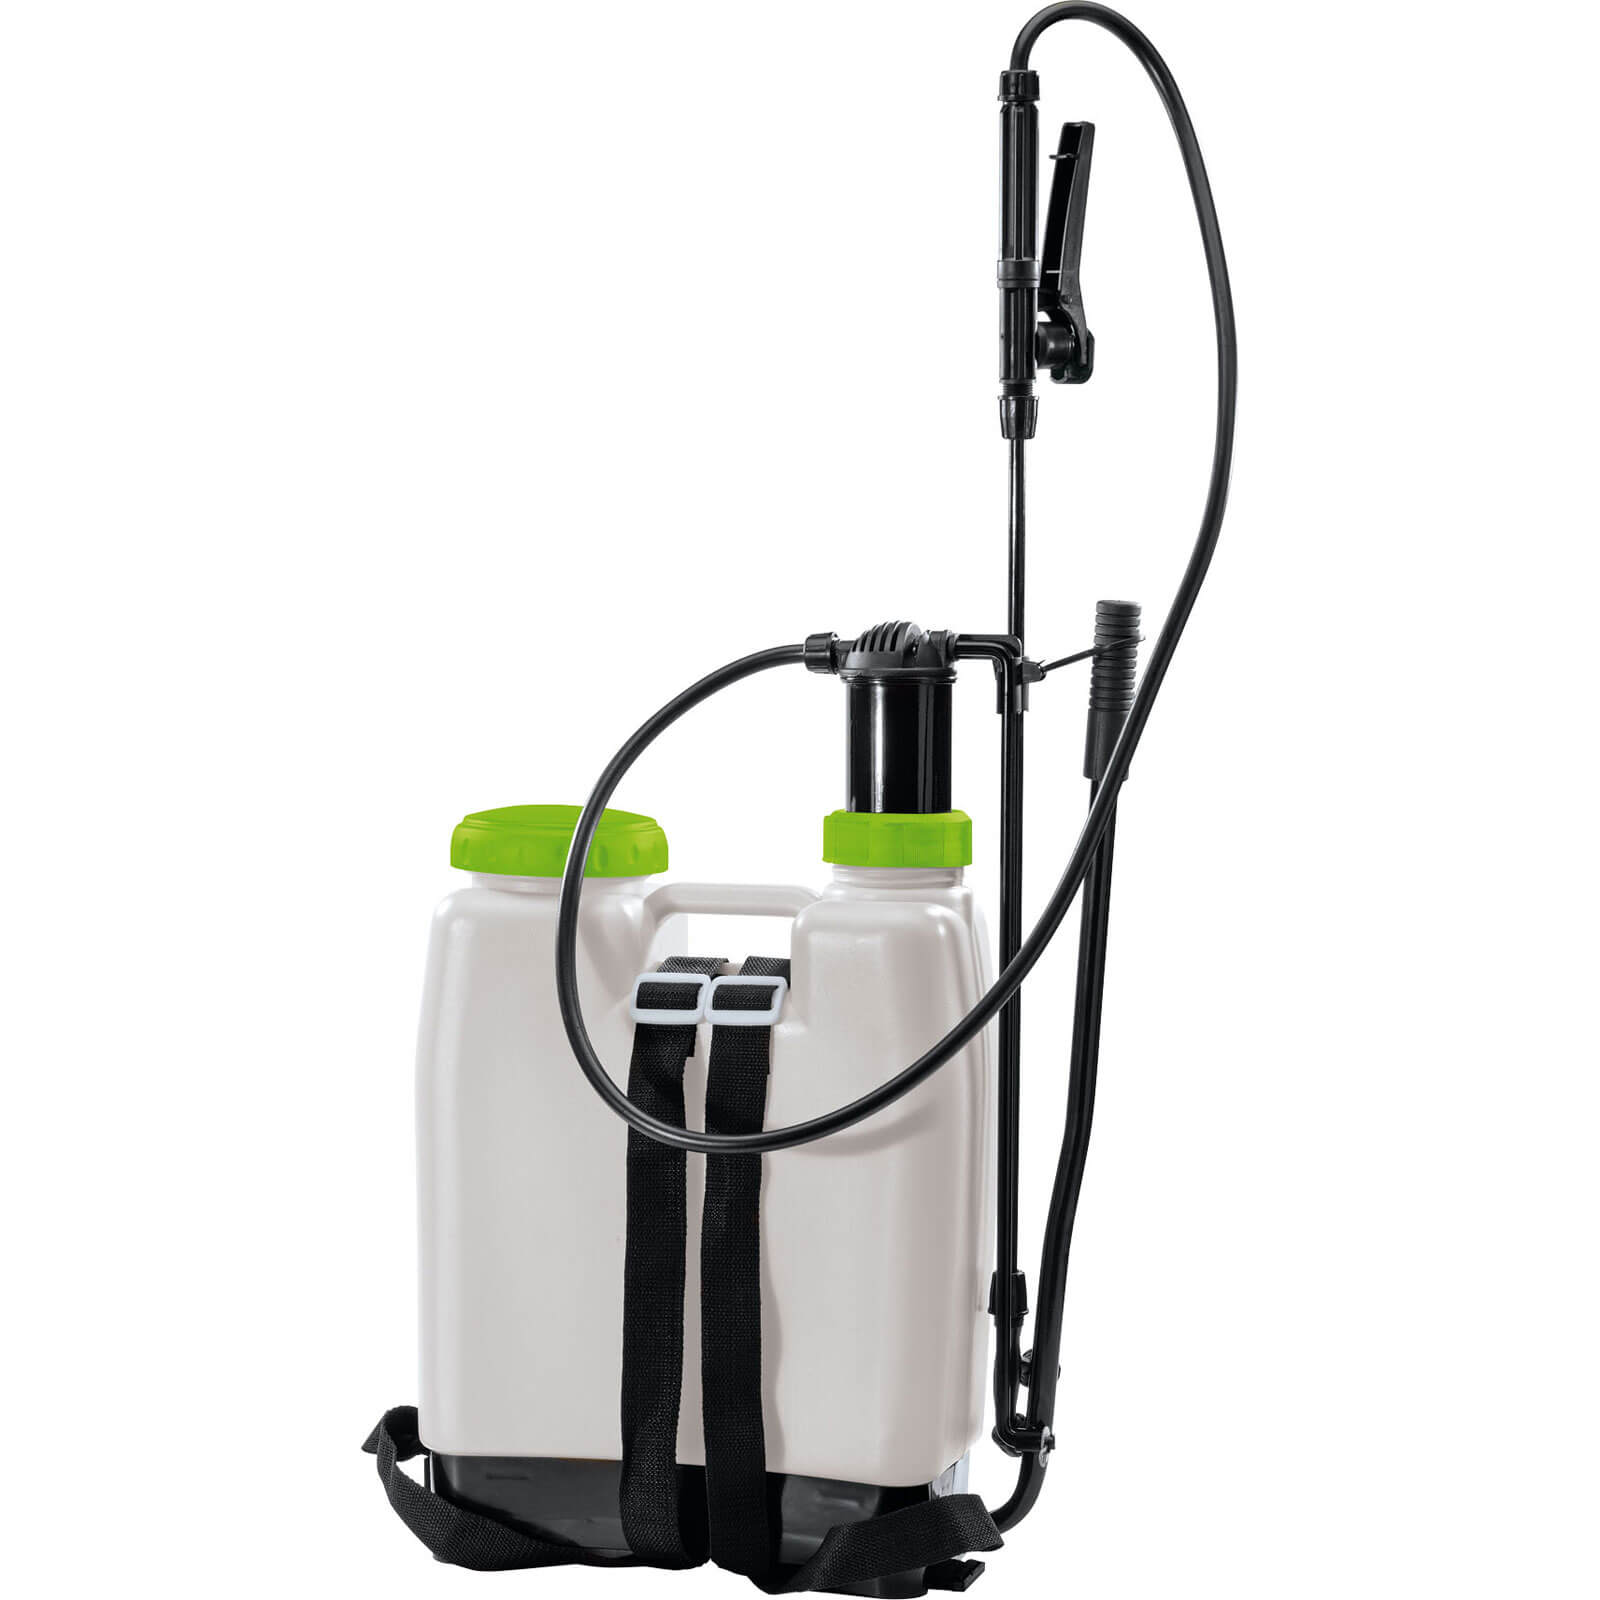 Draper Knapsack Pressure Sprayer 12l